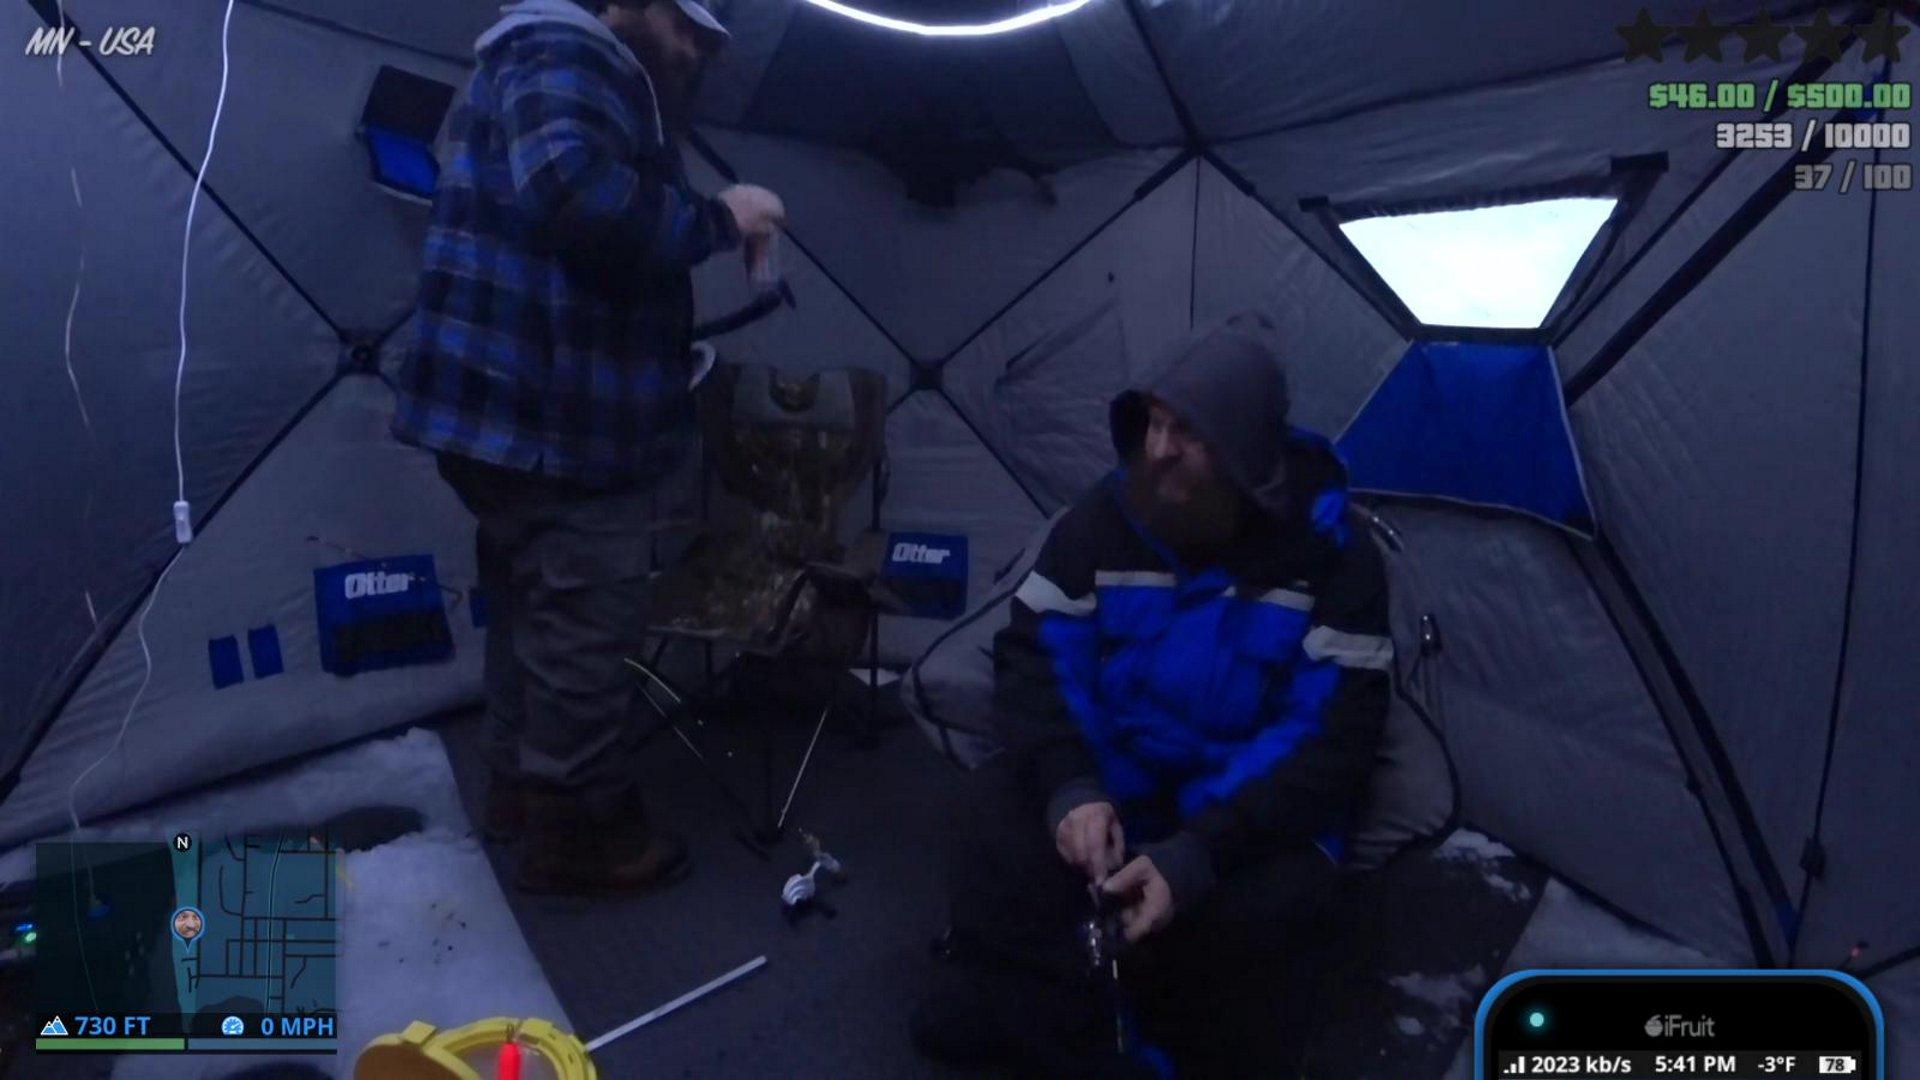 sturgeoncon-2021-live-on-the-st-croix-river-just-chatting-0301-https-t-co-3plulxt5cm-https-t-co-bynbgzxprk